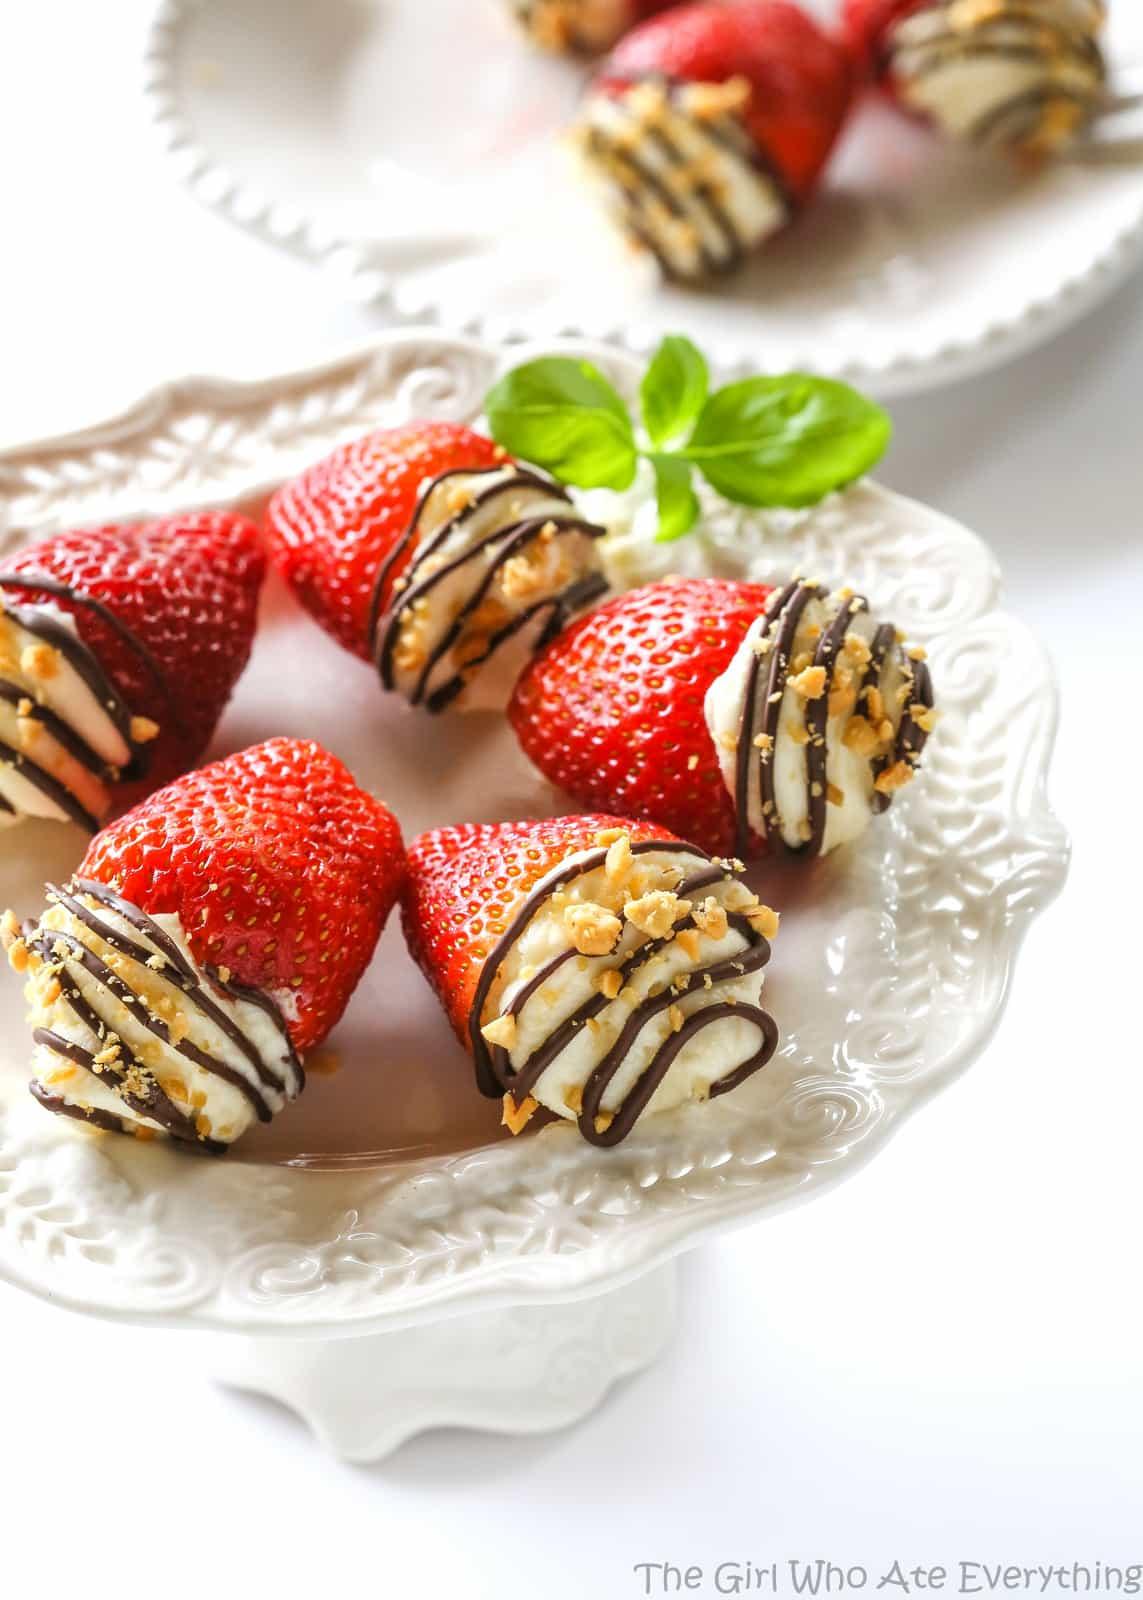 Mascarpone Stuffed Strawberries.